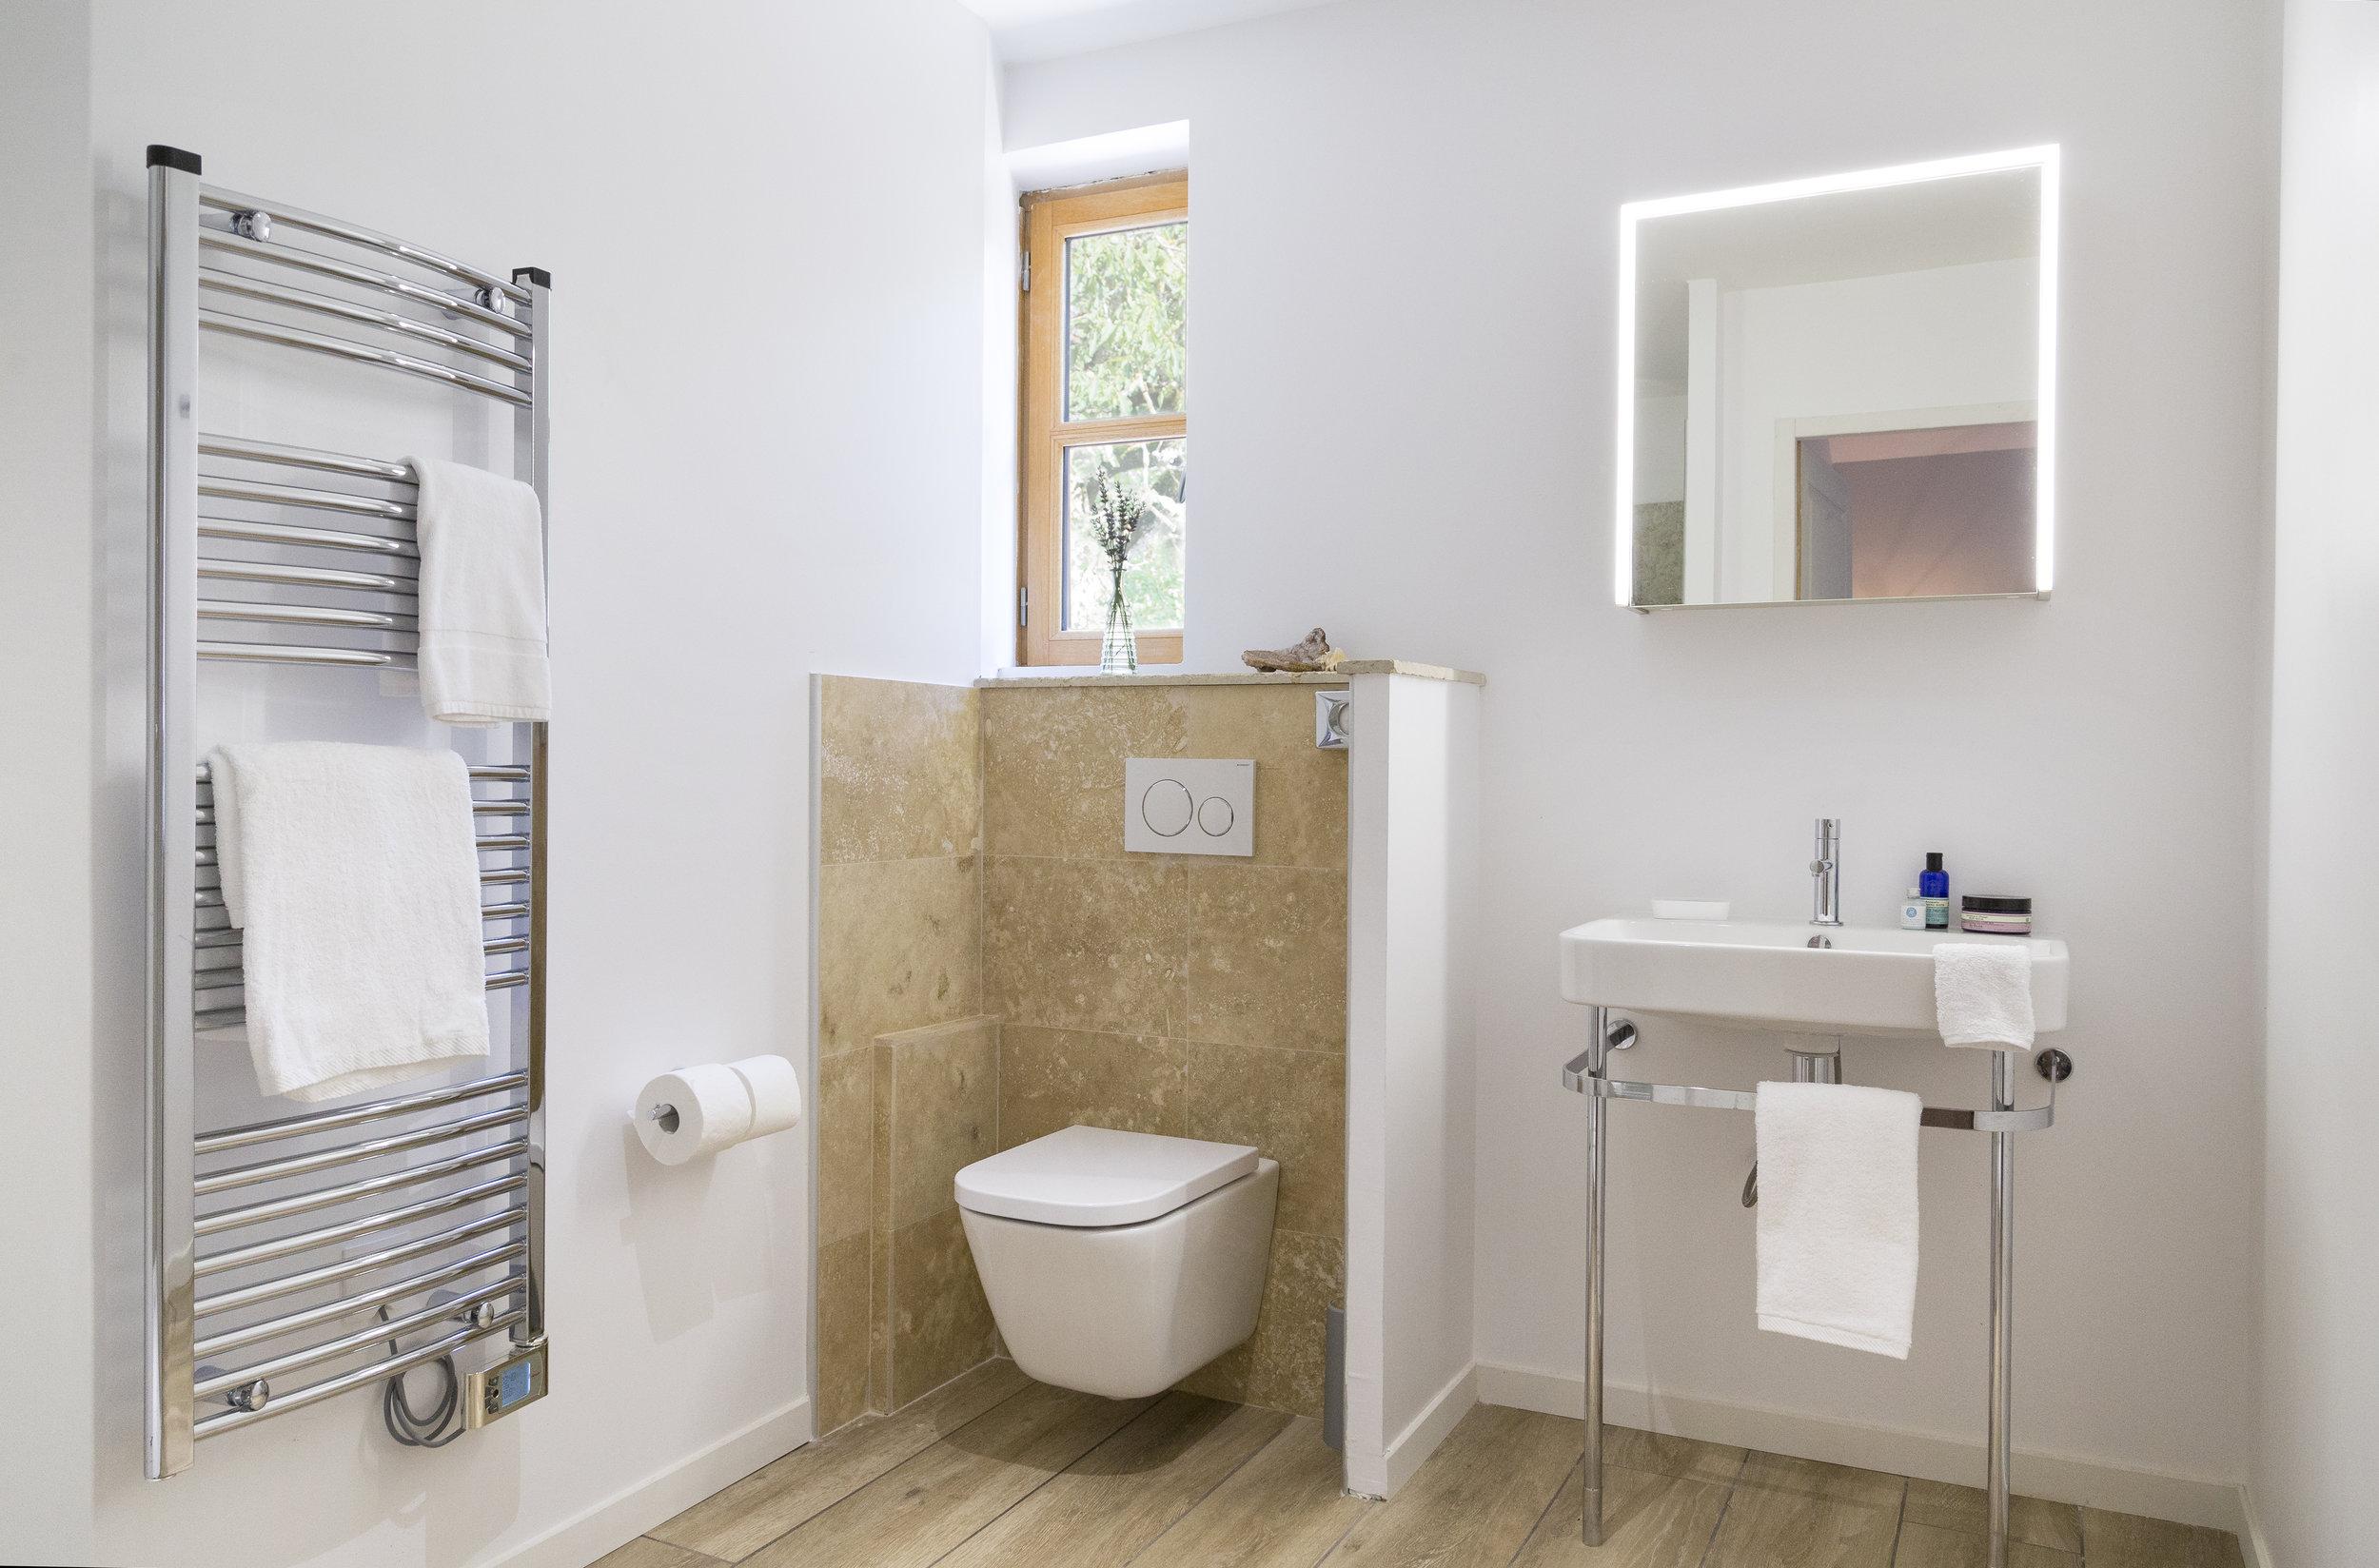 Bathroom1_v1.jpg